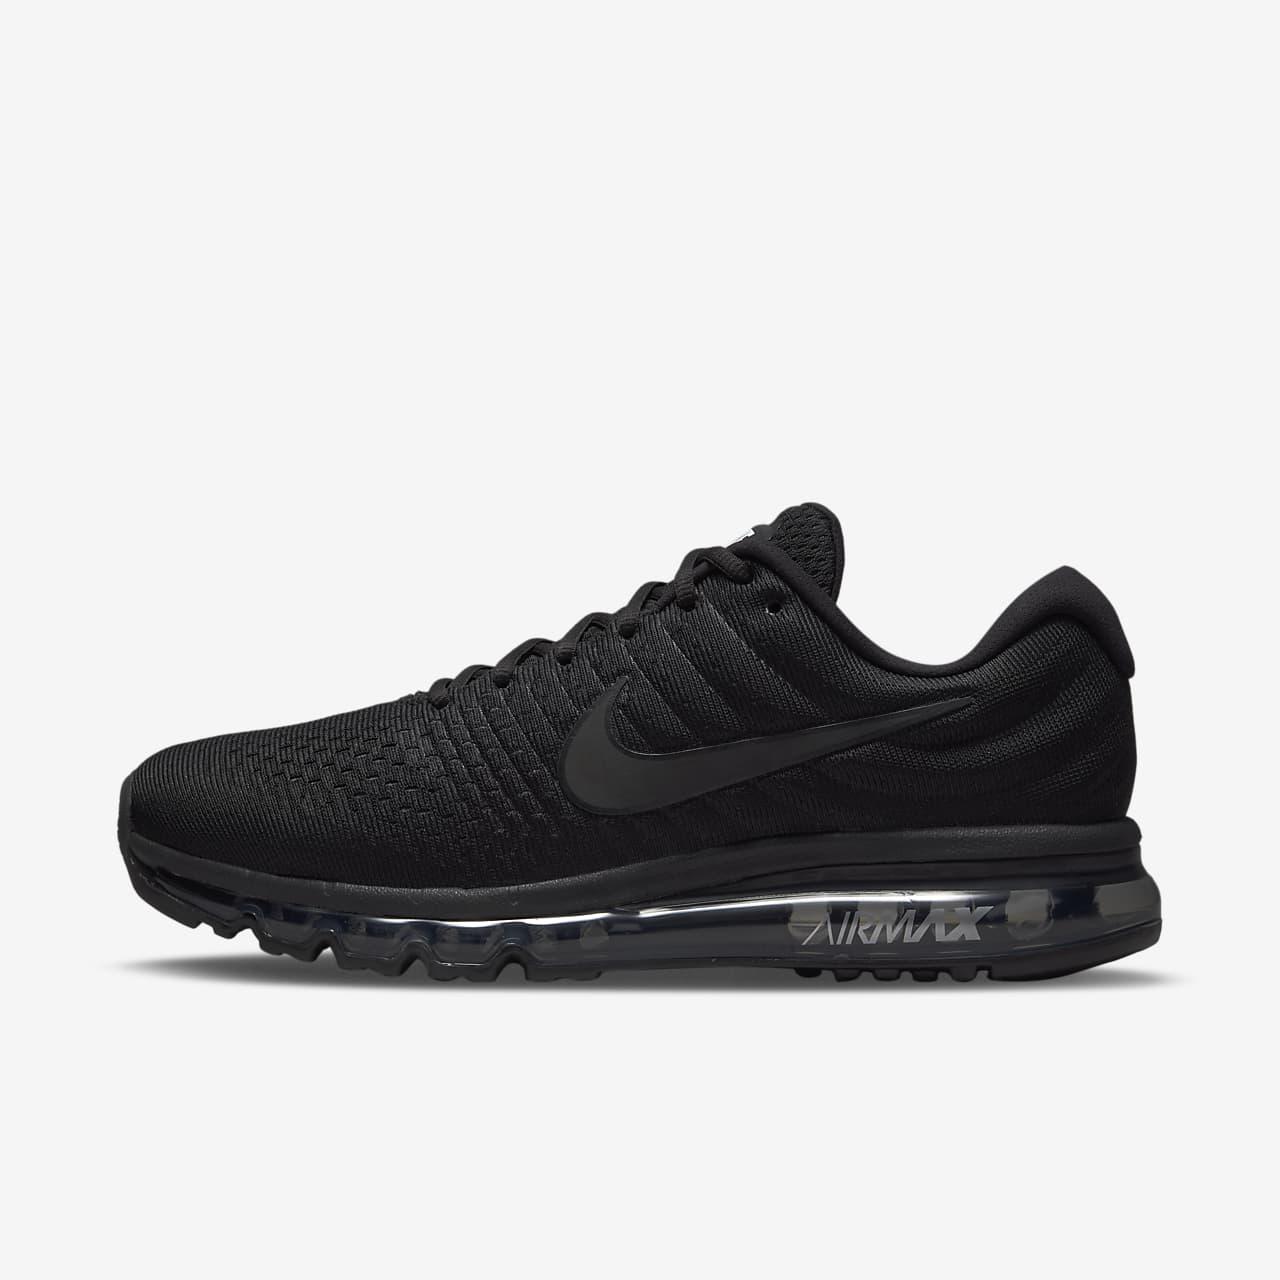 Nike Air Max 1 Erkekler Popüler Ayakkabı Siyah Gri Mavi Best Deals